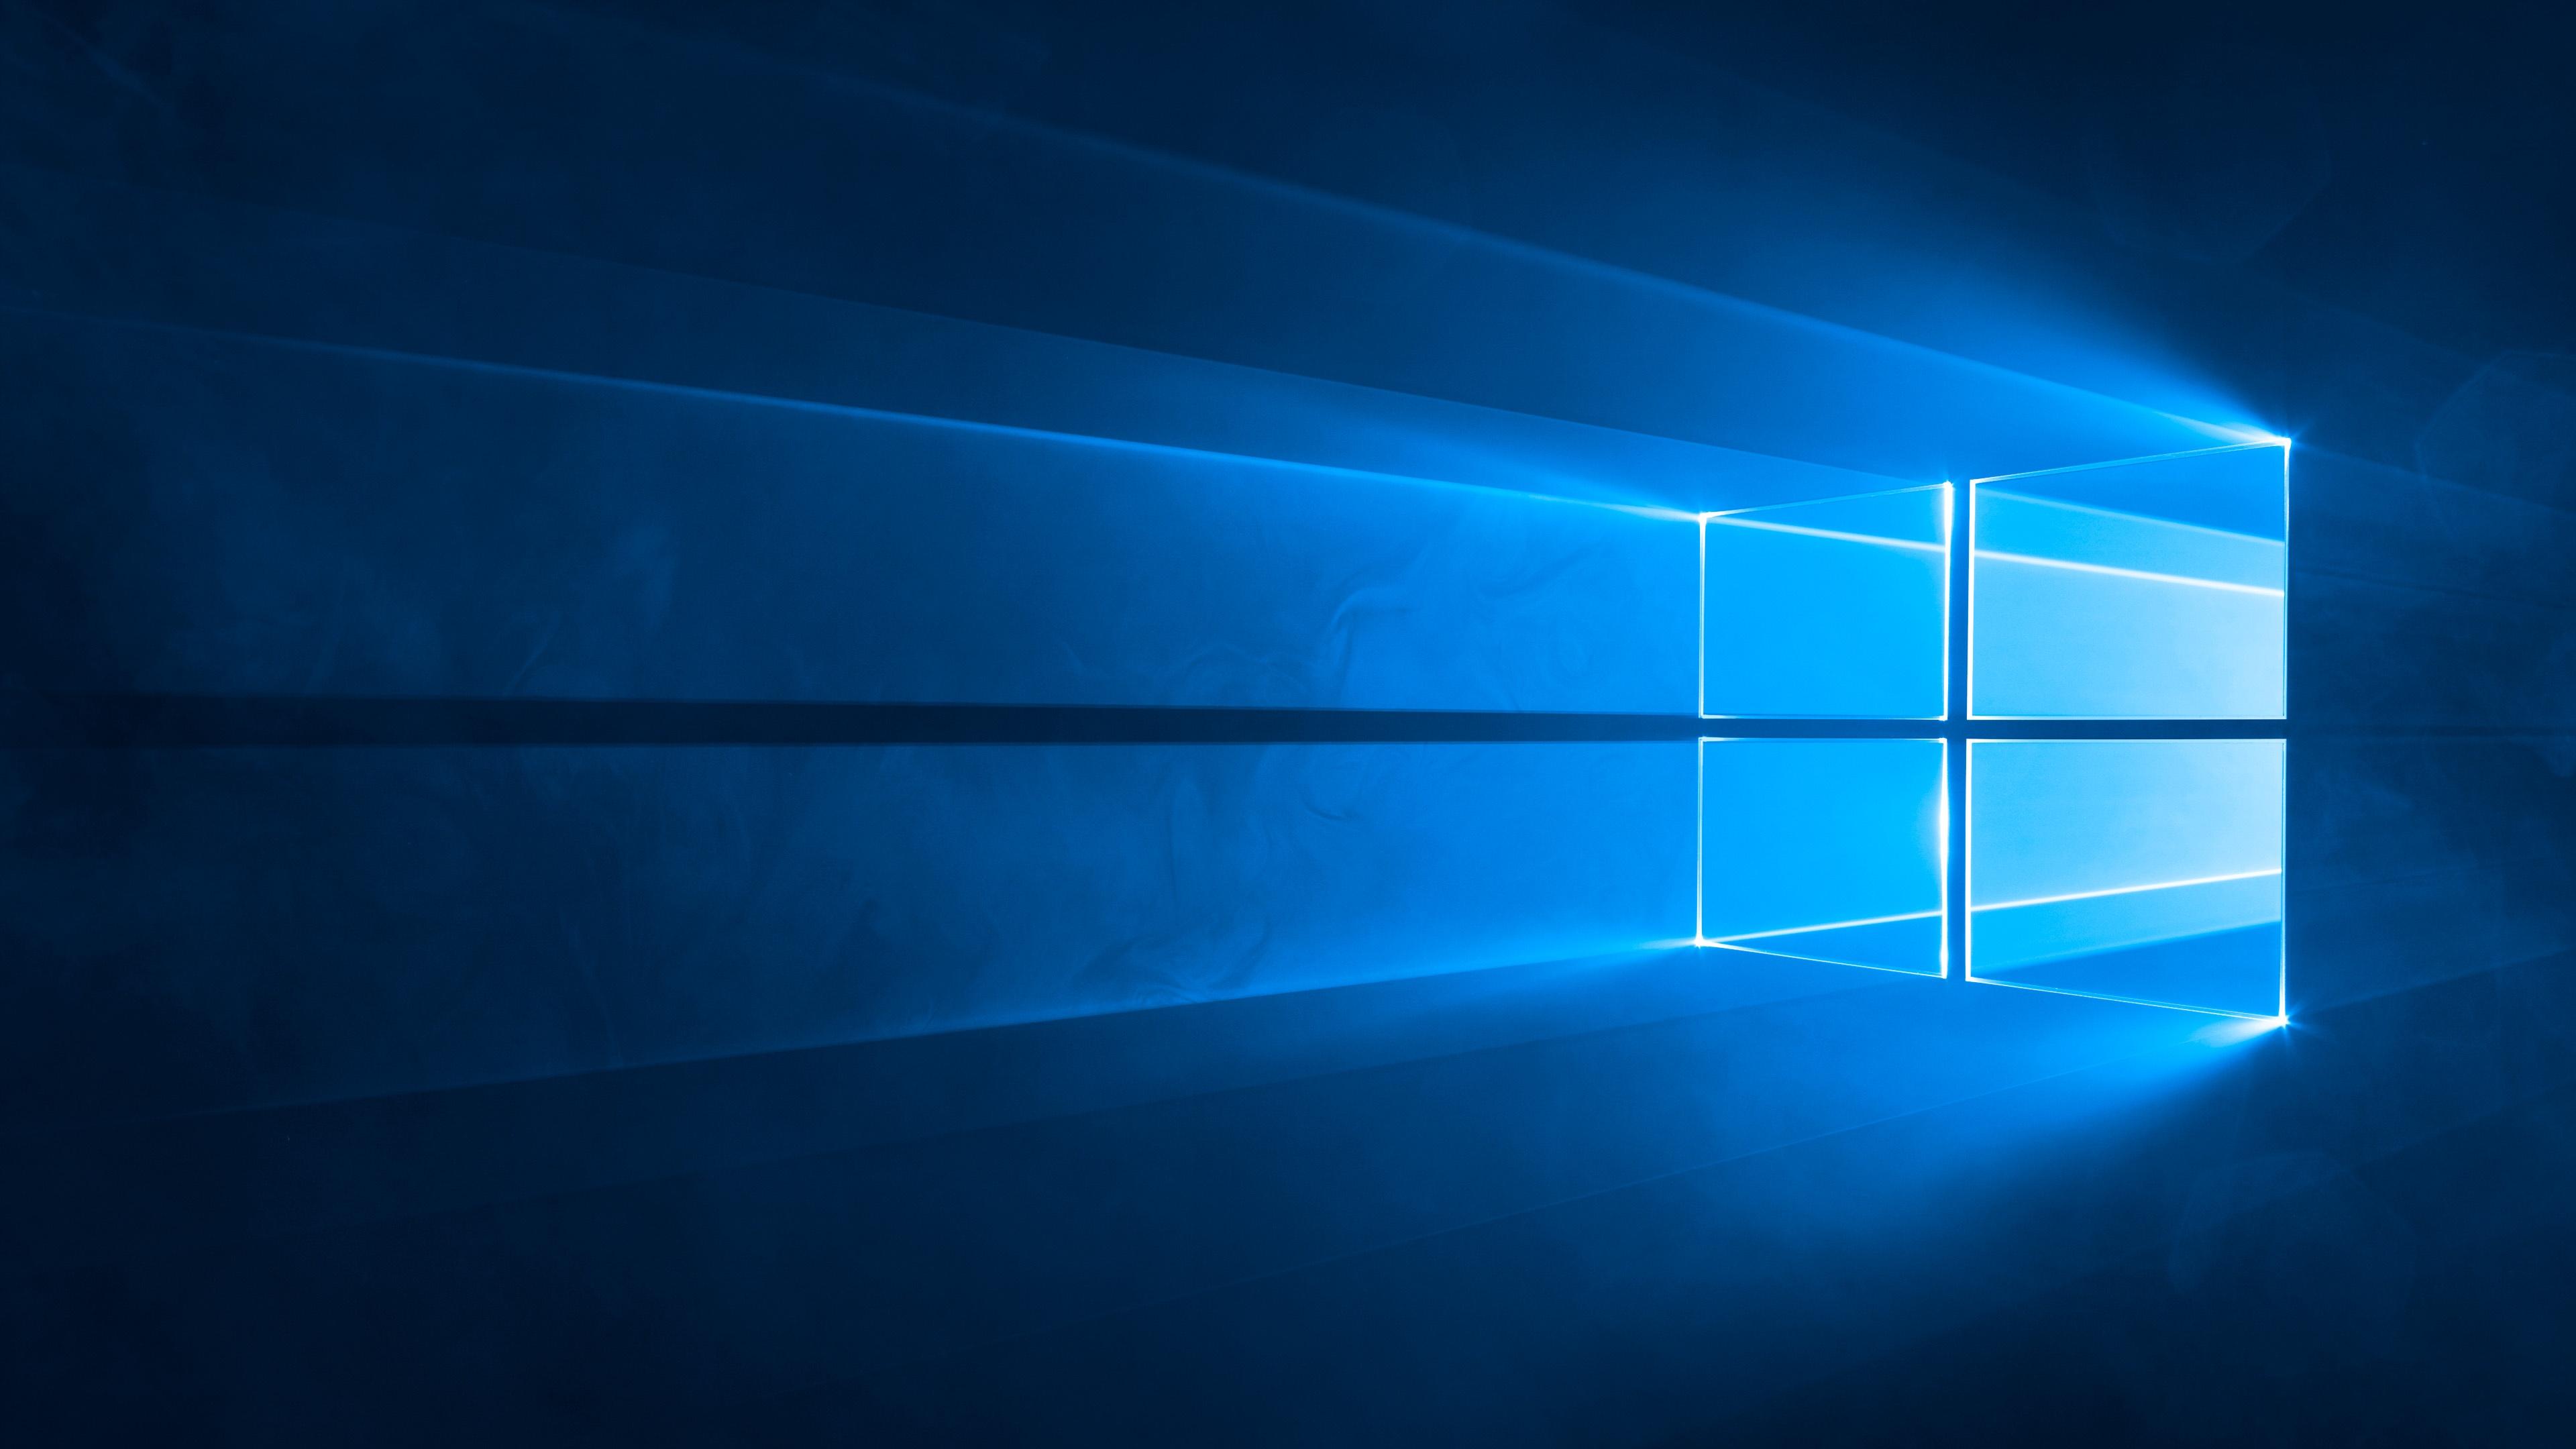 Use the New Emoji in Windows 10.